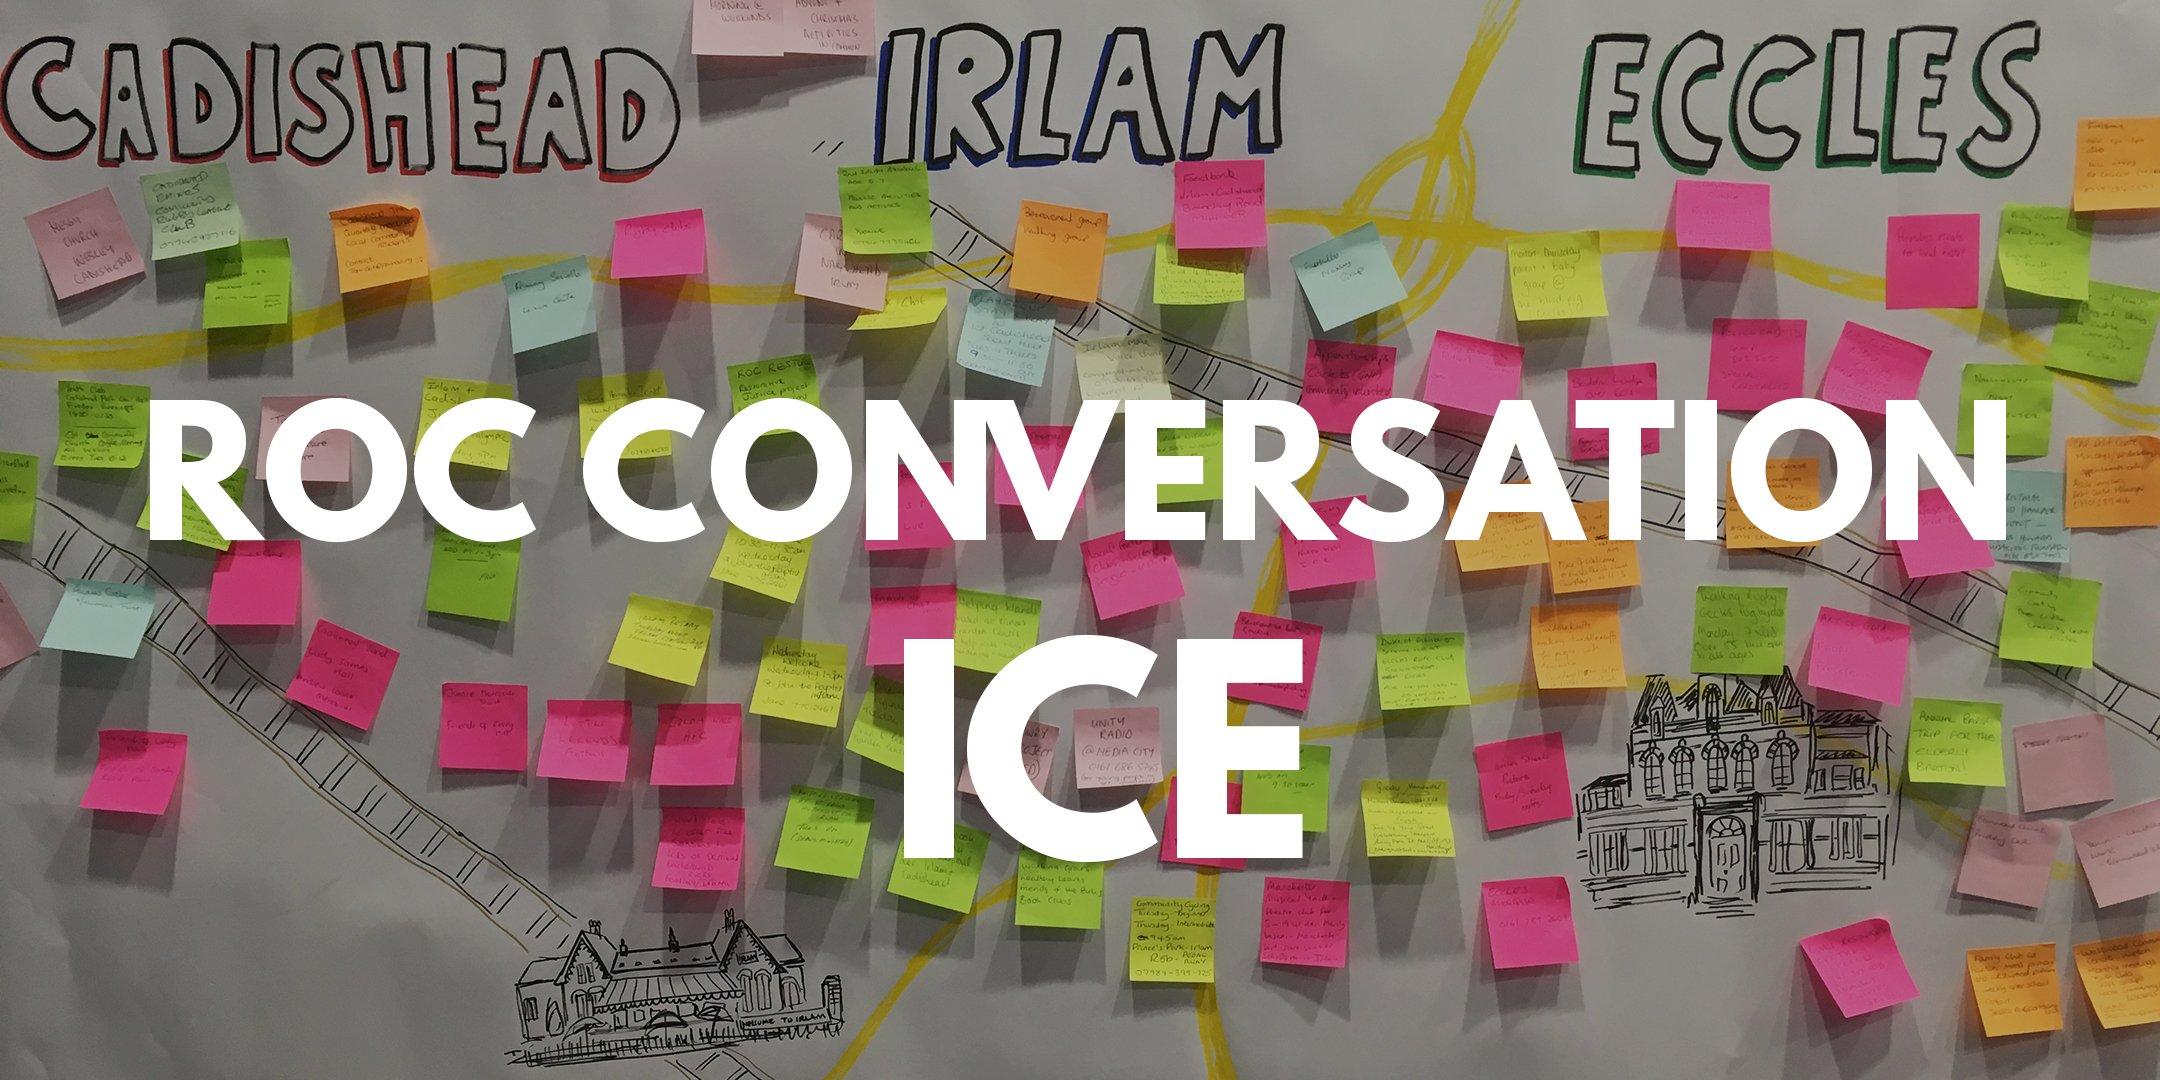 ROC CONVERSATION: ICE